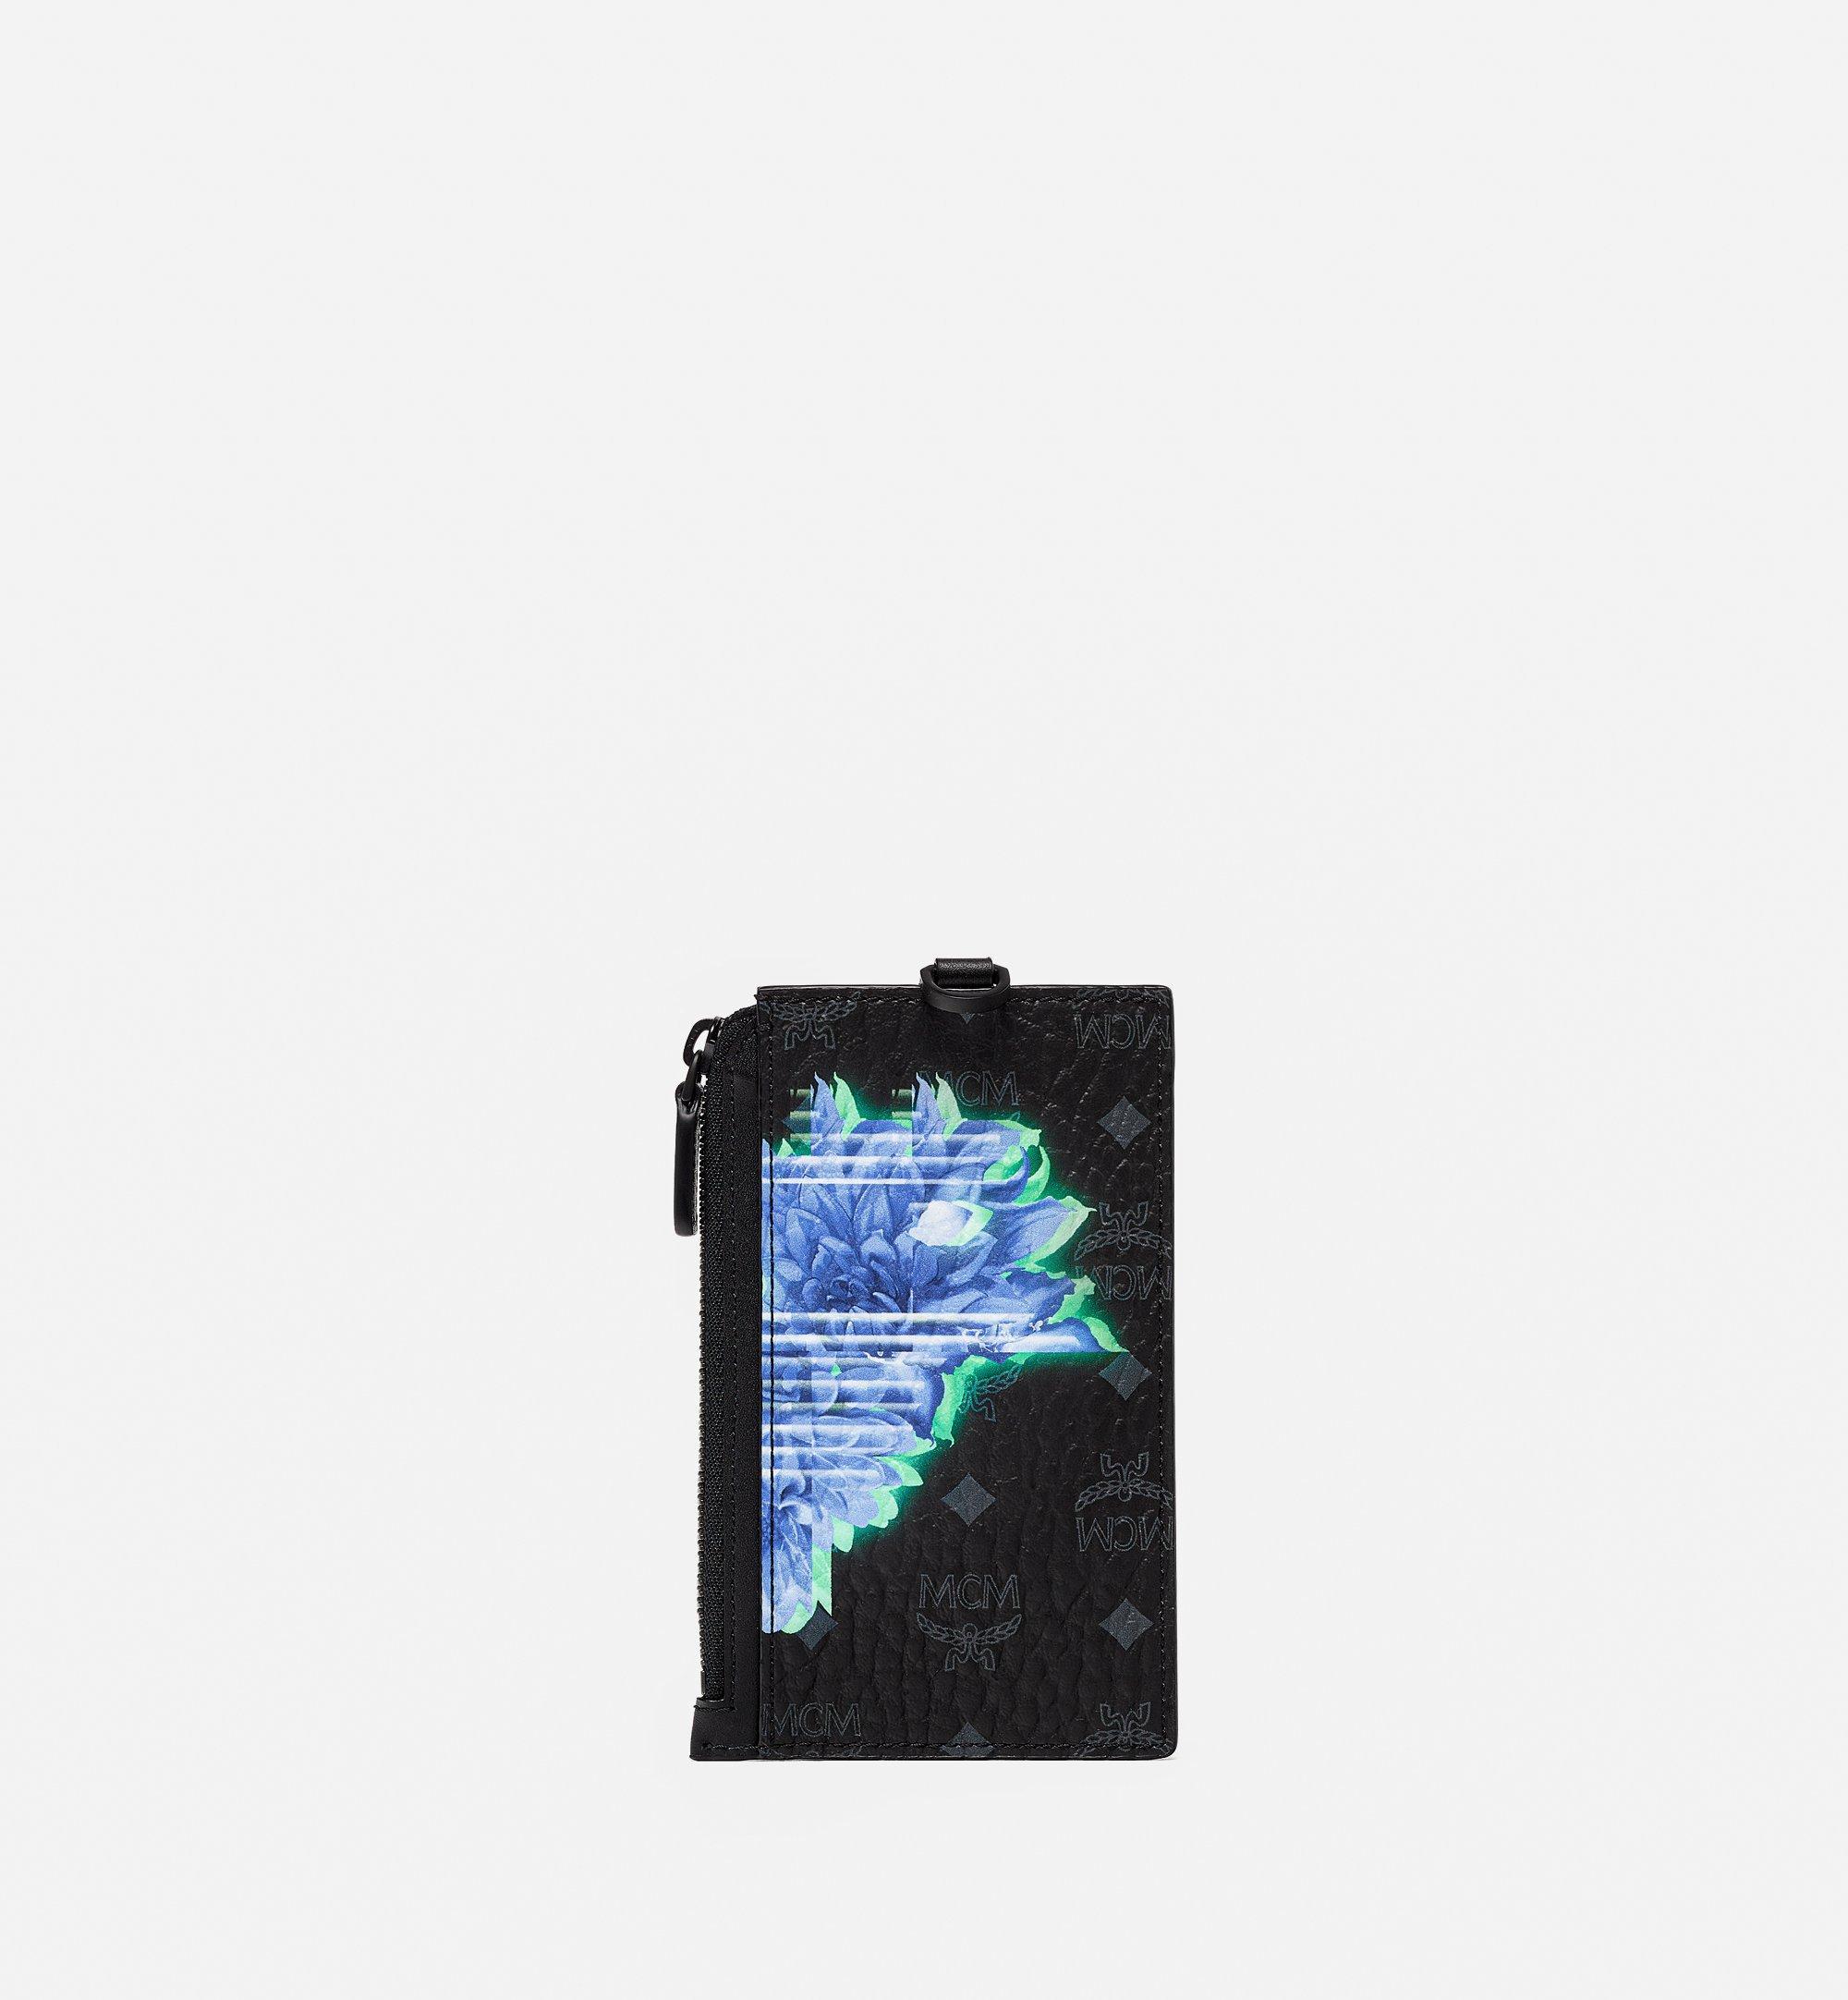 MCM Lanyard Card Holder in Tech Flower Visetos Black MXZBSSX04BK001 Alternate View 2